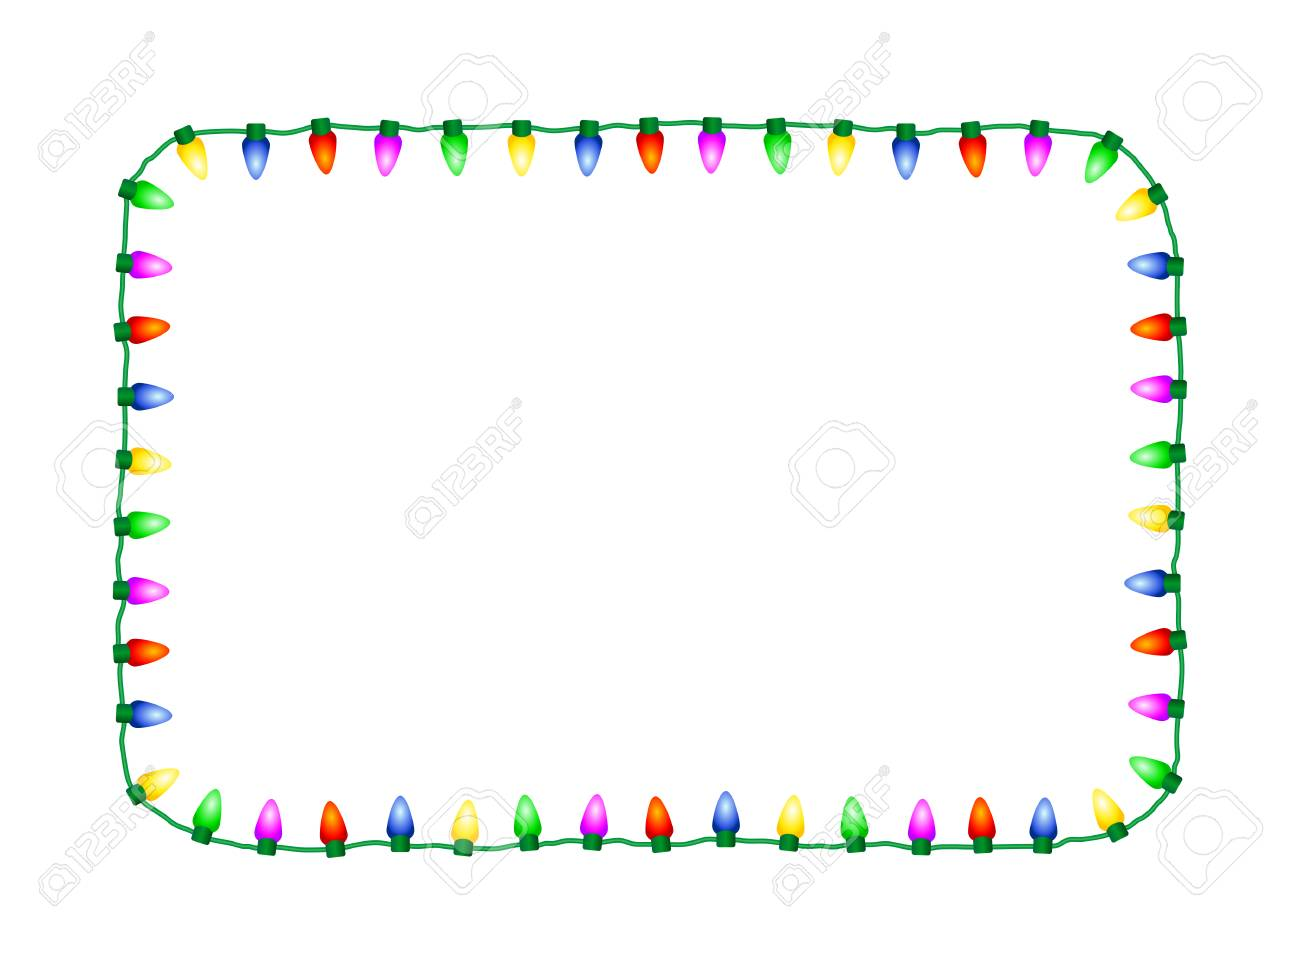 Christmas Lights Vector Free.Decorative Seasonal Christmas Lights Vector Rectangular Frame